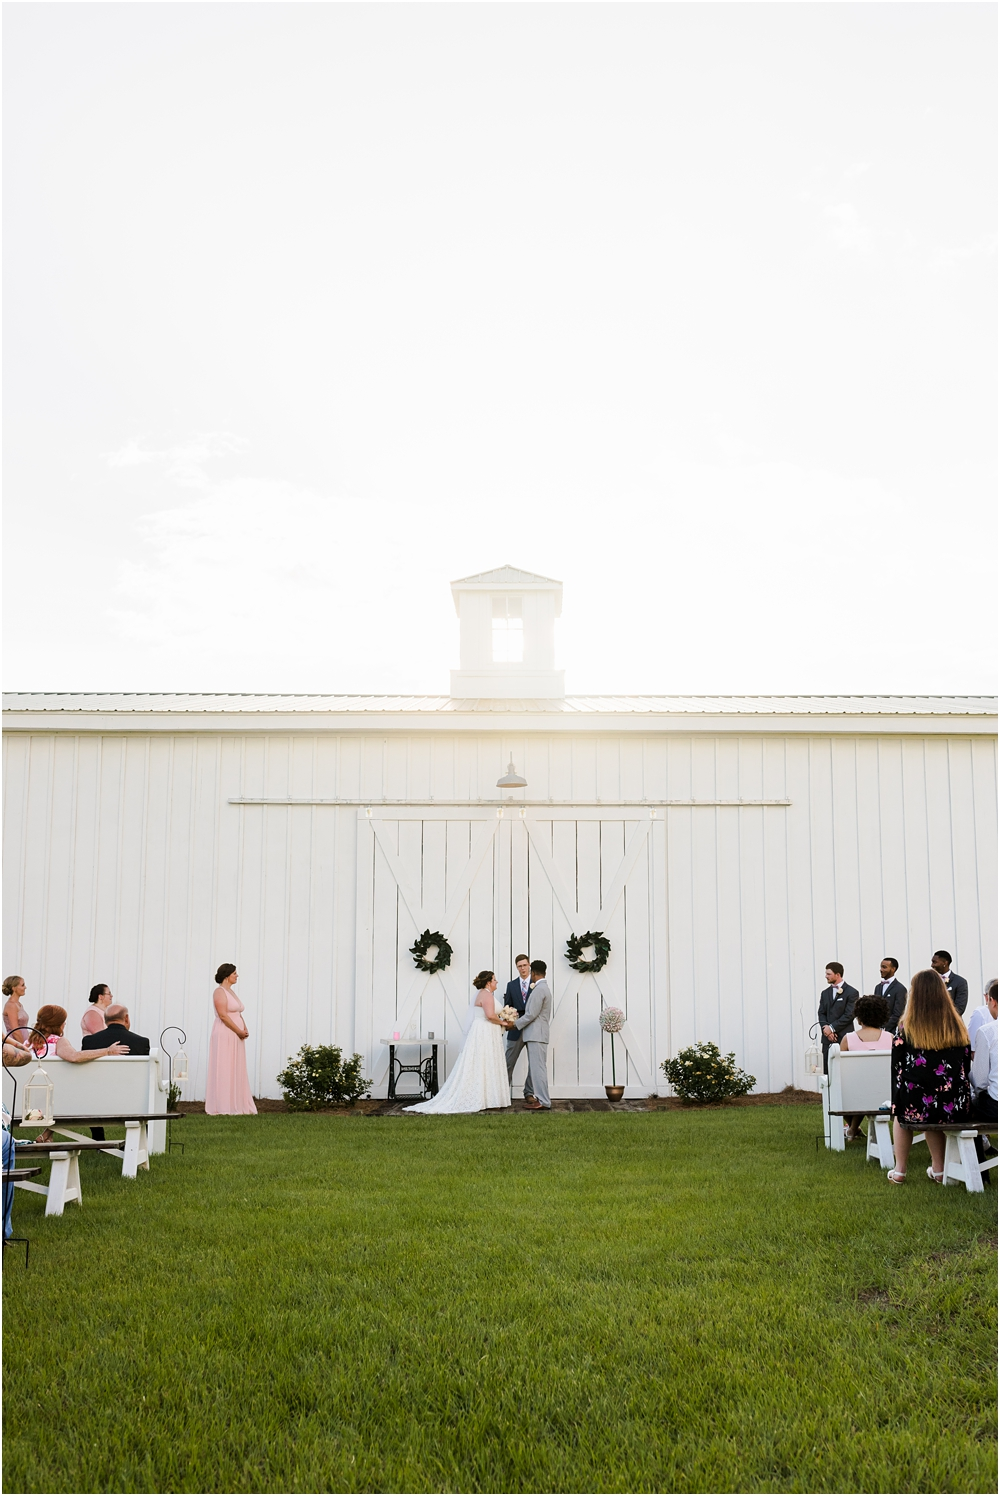 mosley-wedding-kiersten-stevenson-photography-30a-panama-city-beach-dothan-tallahassee-(159-of-472).JPG